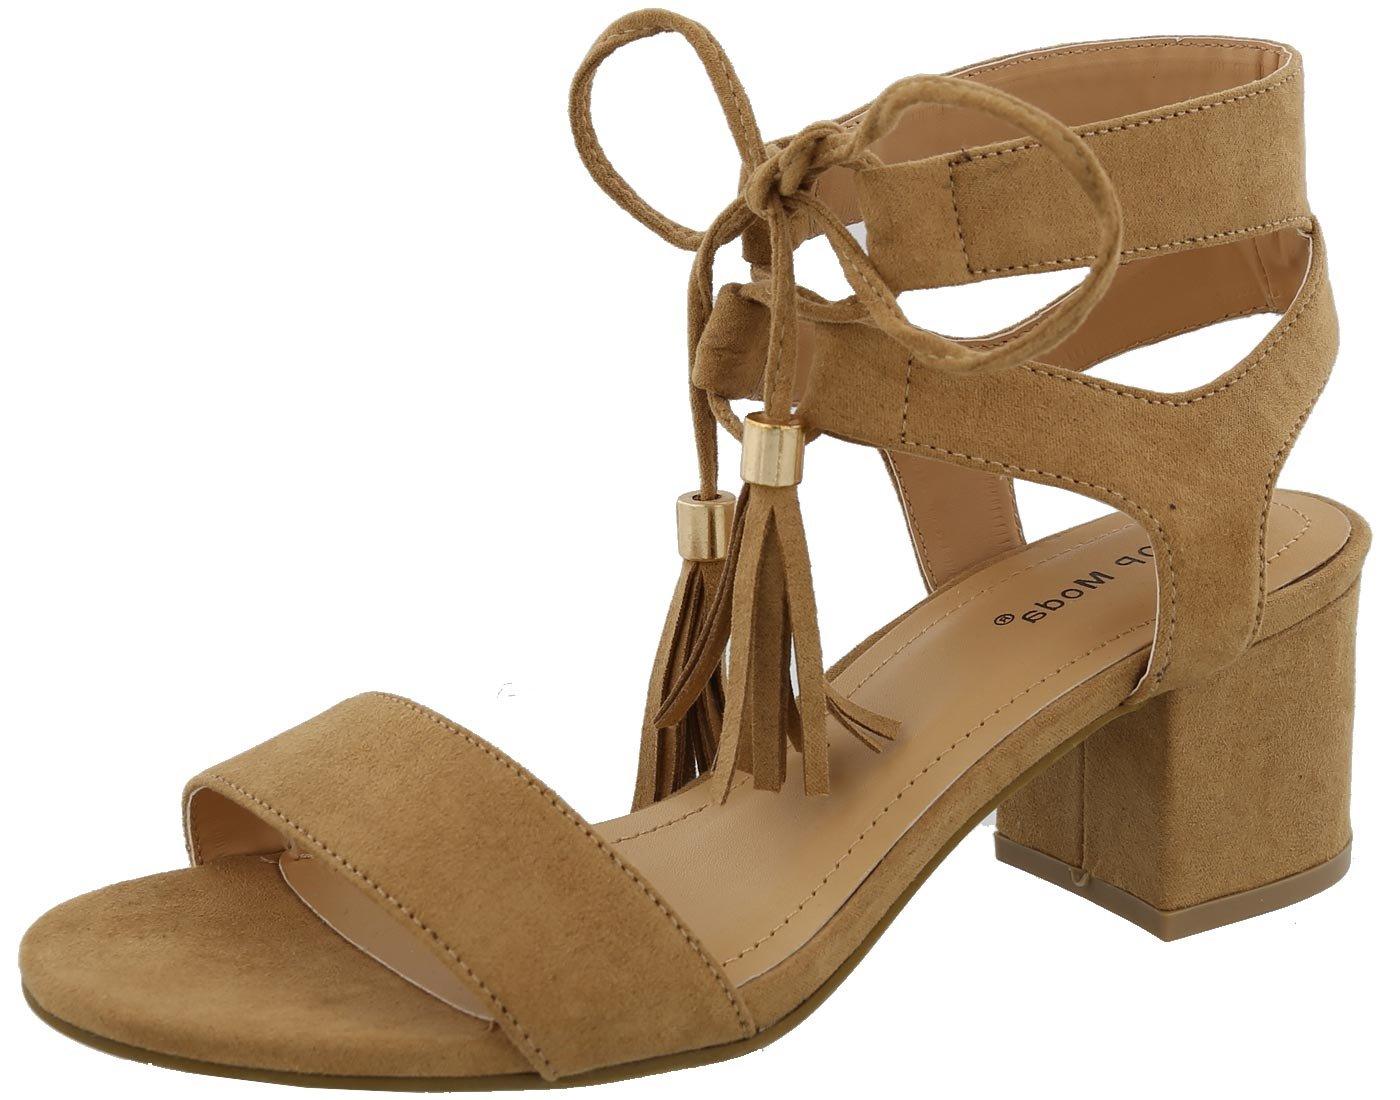 Top Moda Women's Tassel Stacked Block Heel Gladiator Sandal (8 B(M) US, Tan)